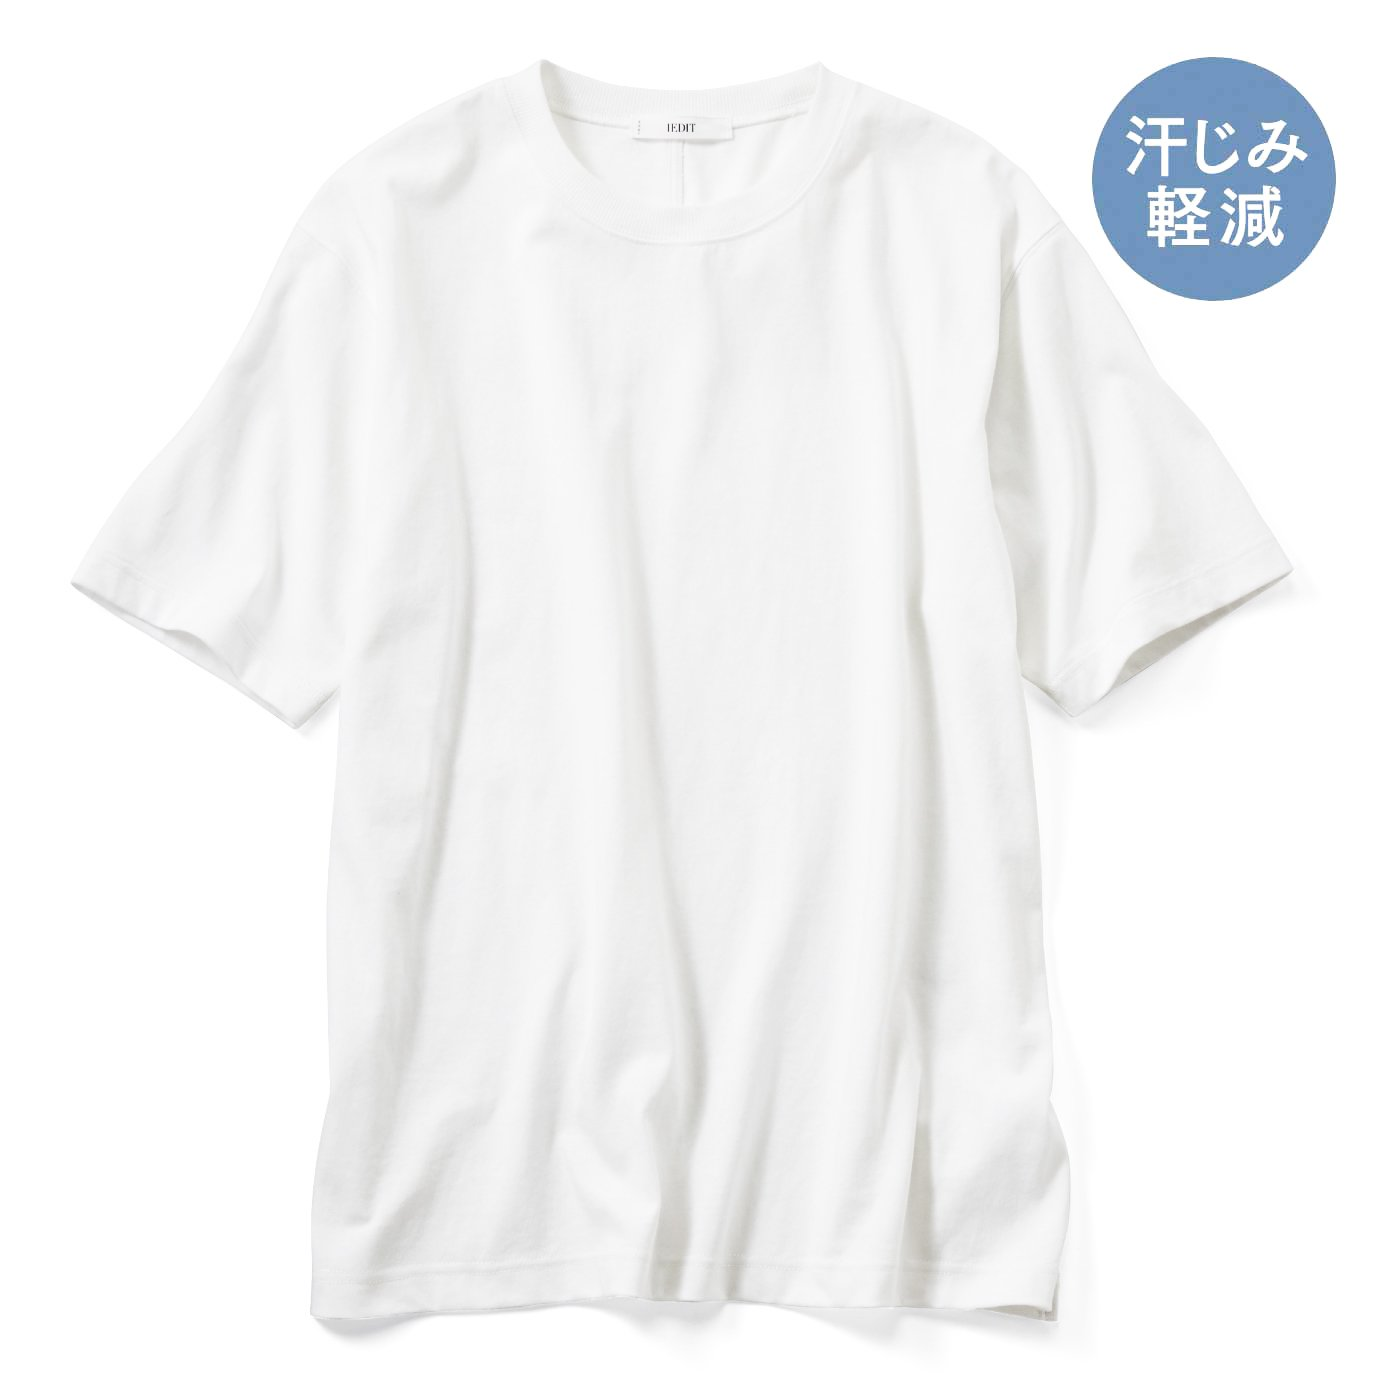 IEDIT[イディット] ユニセックスで使える 汗じみ軽減加工のコットンTシャツの会